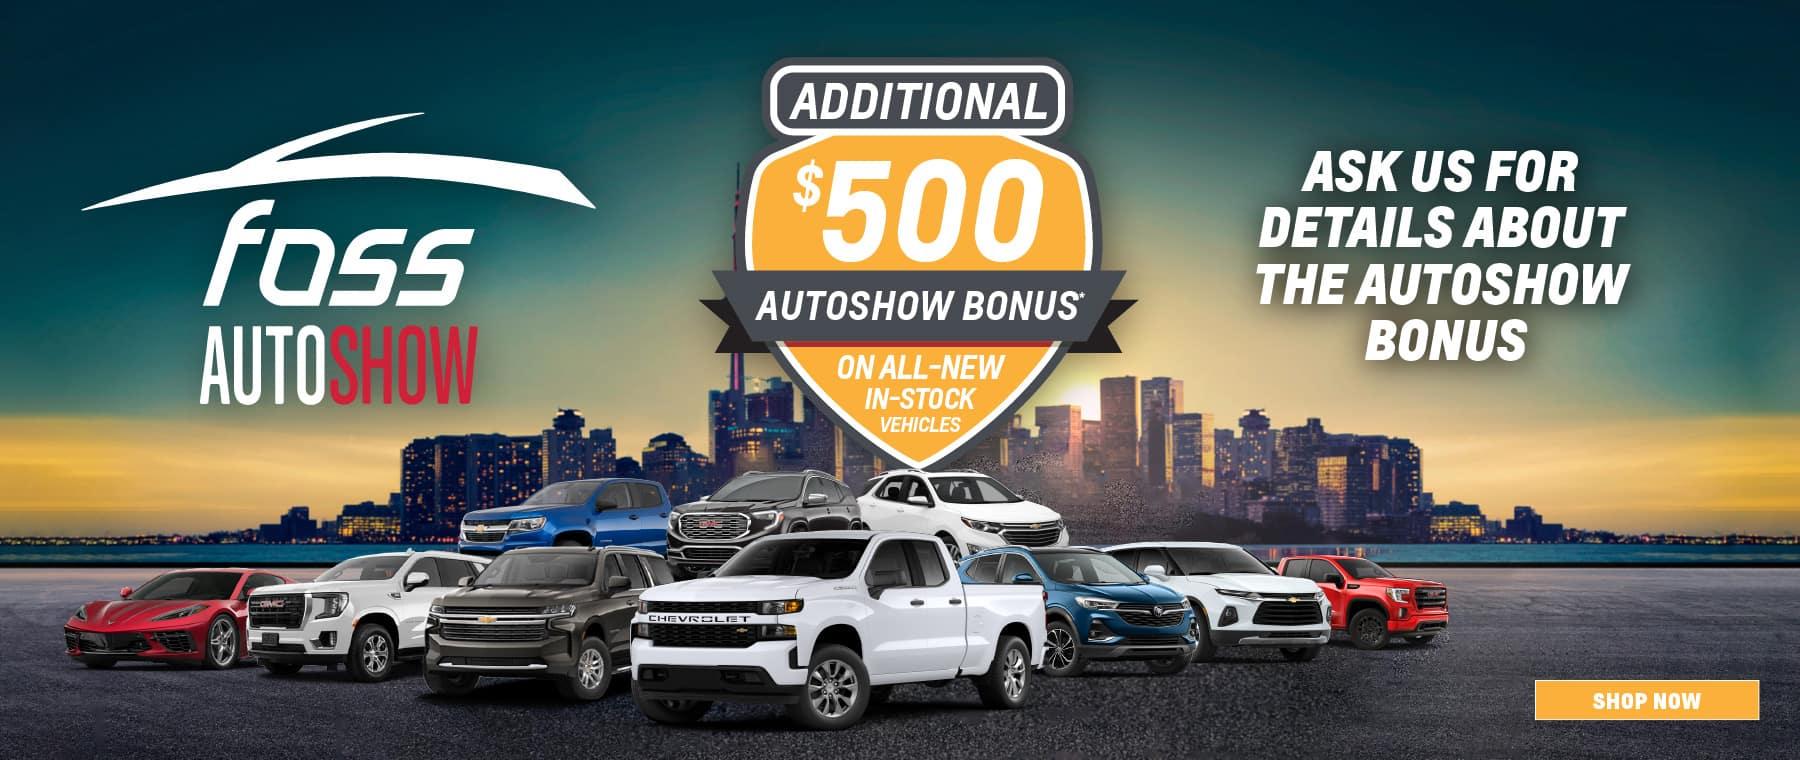 Thornhill – Foss Auto Show Bonus – Dealerinspire Banner 1800×760